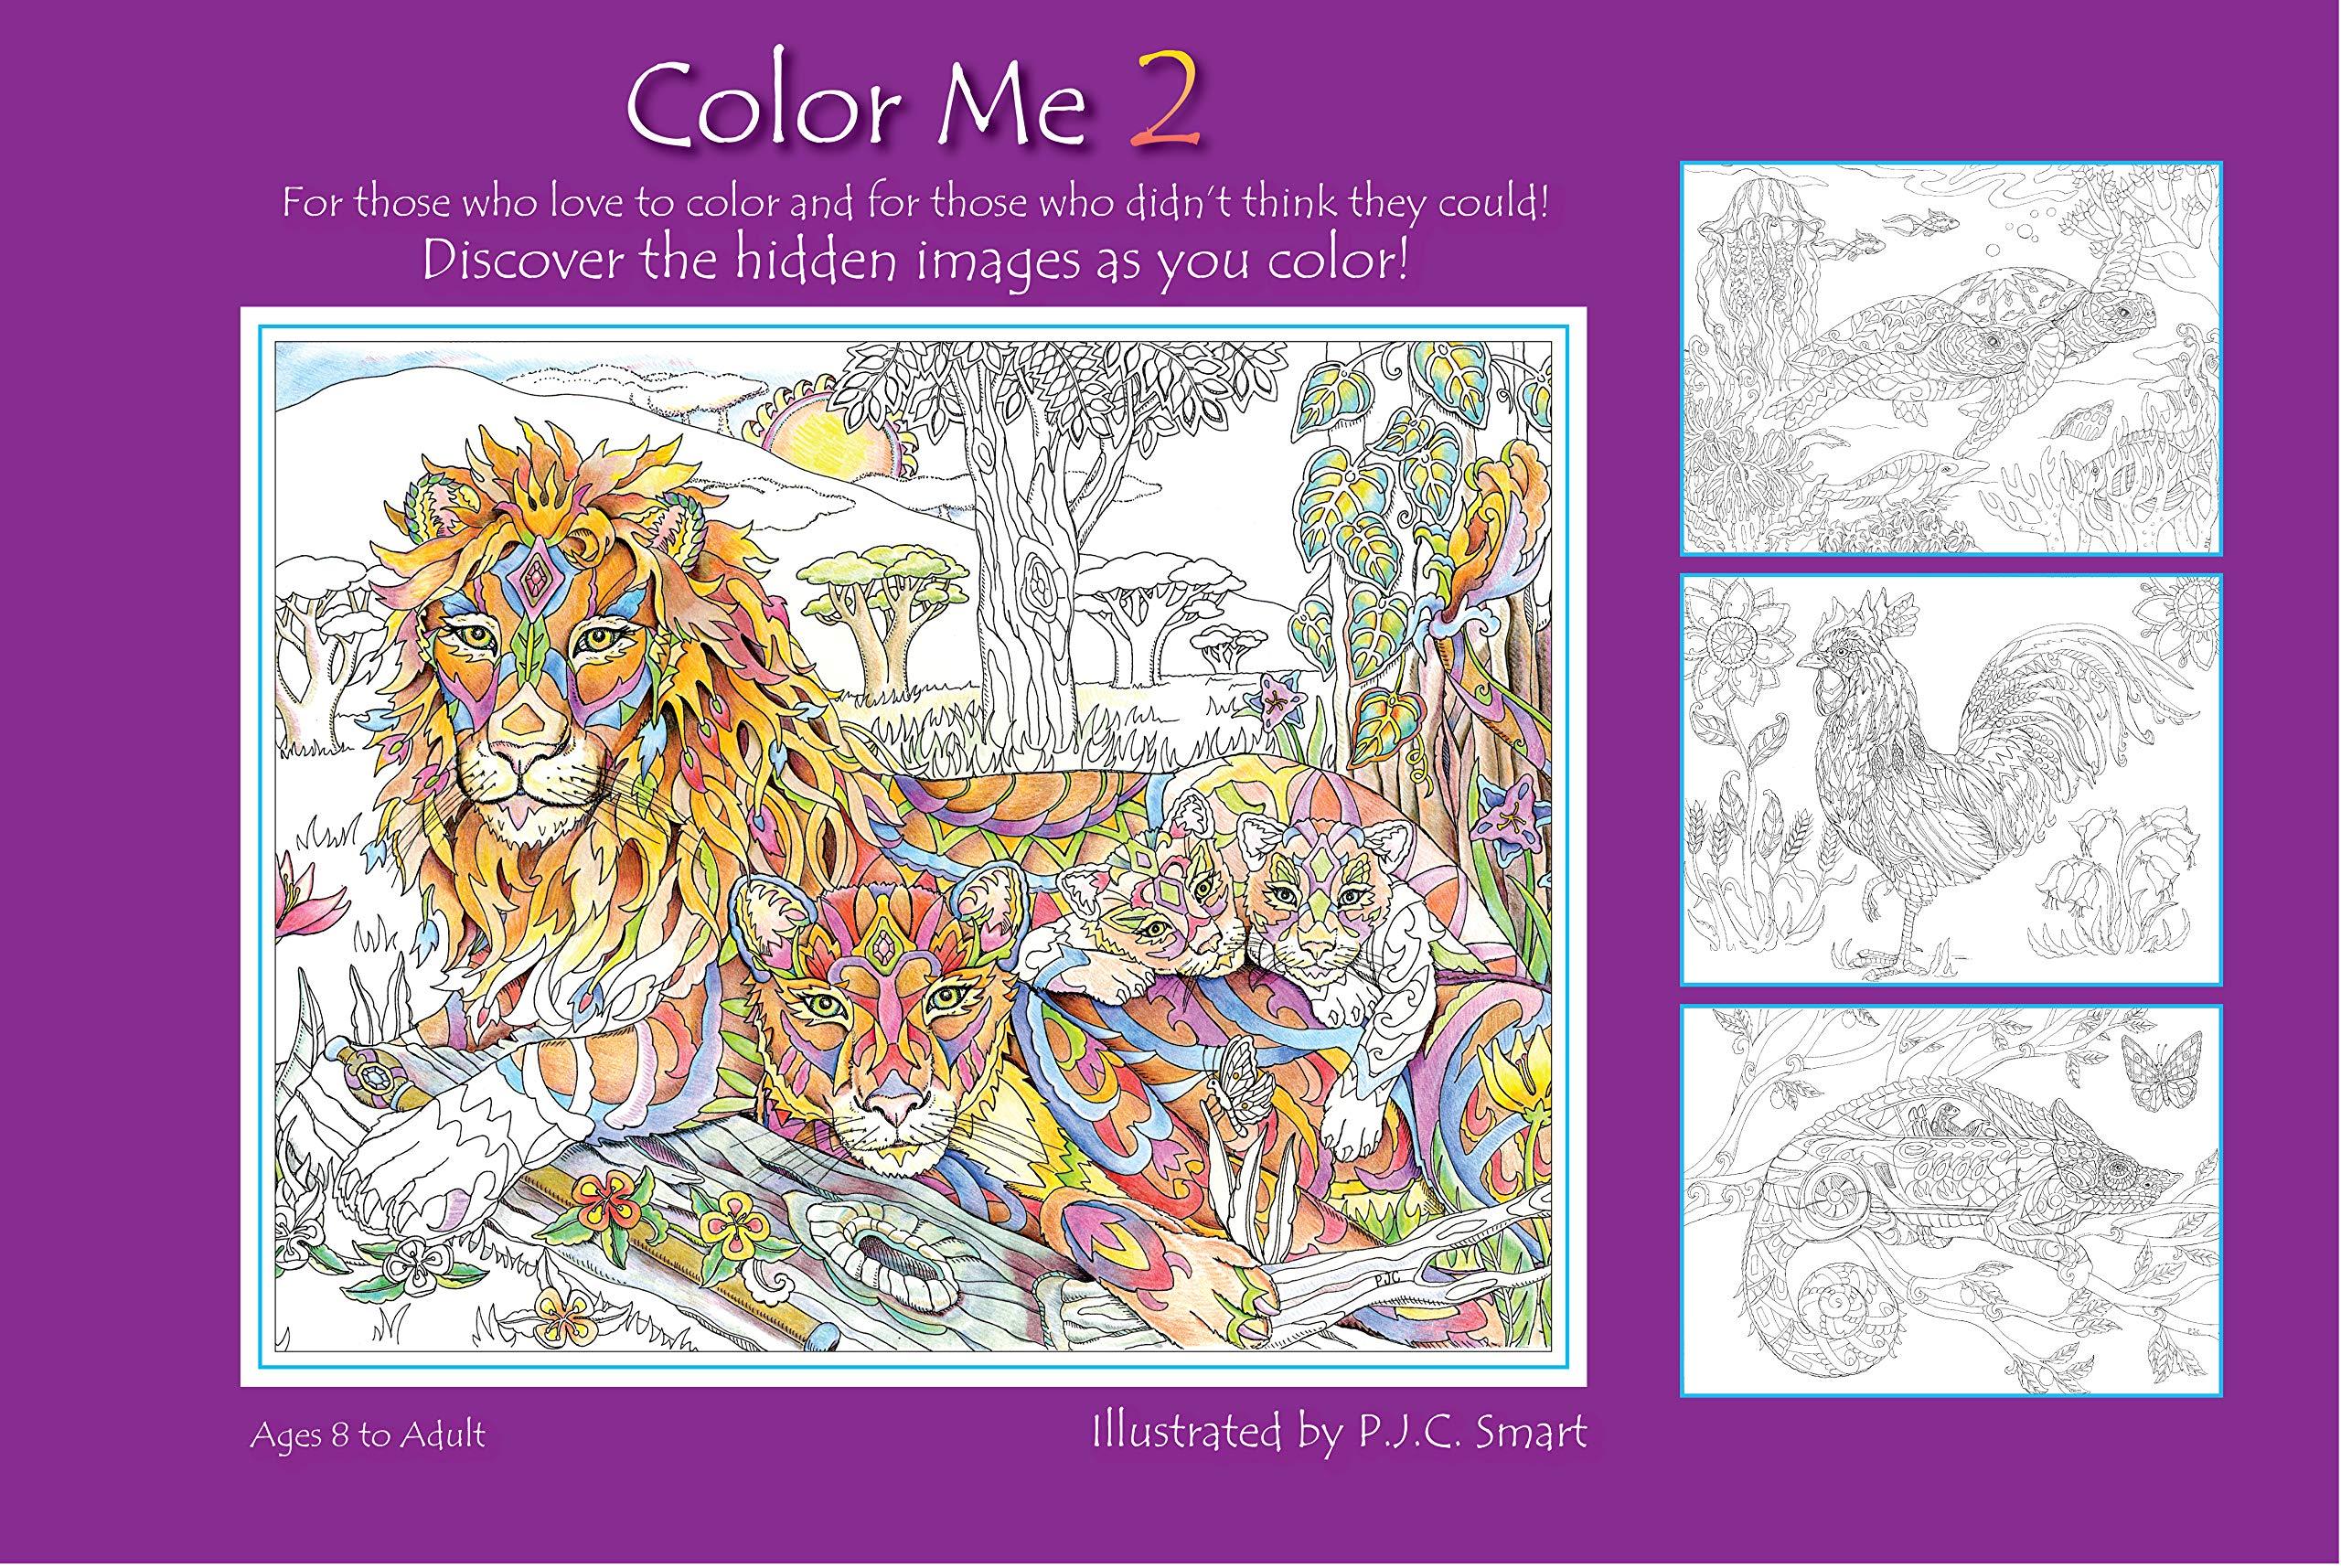 - Color Me 2: Smart, Pamela: 9781467533942: Amazon.com: Books